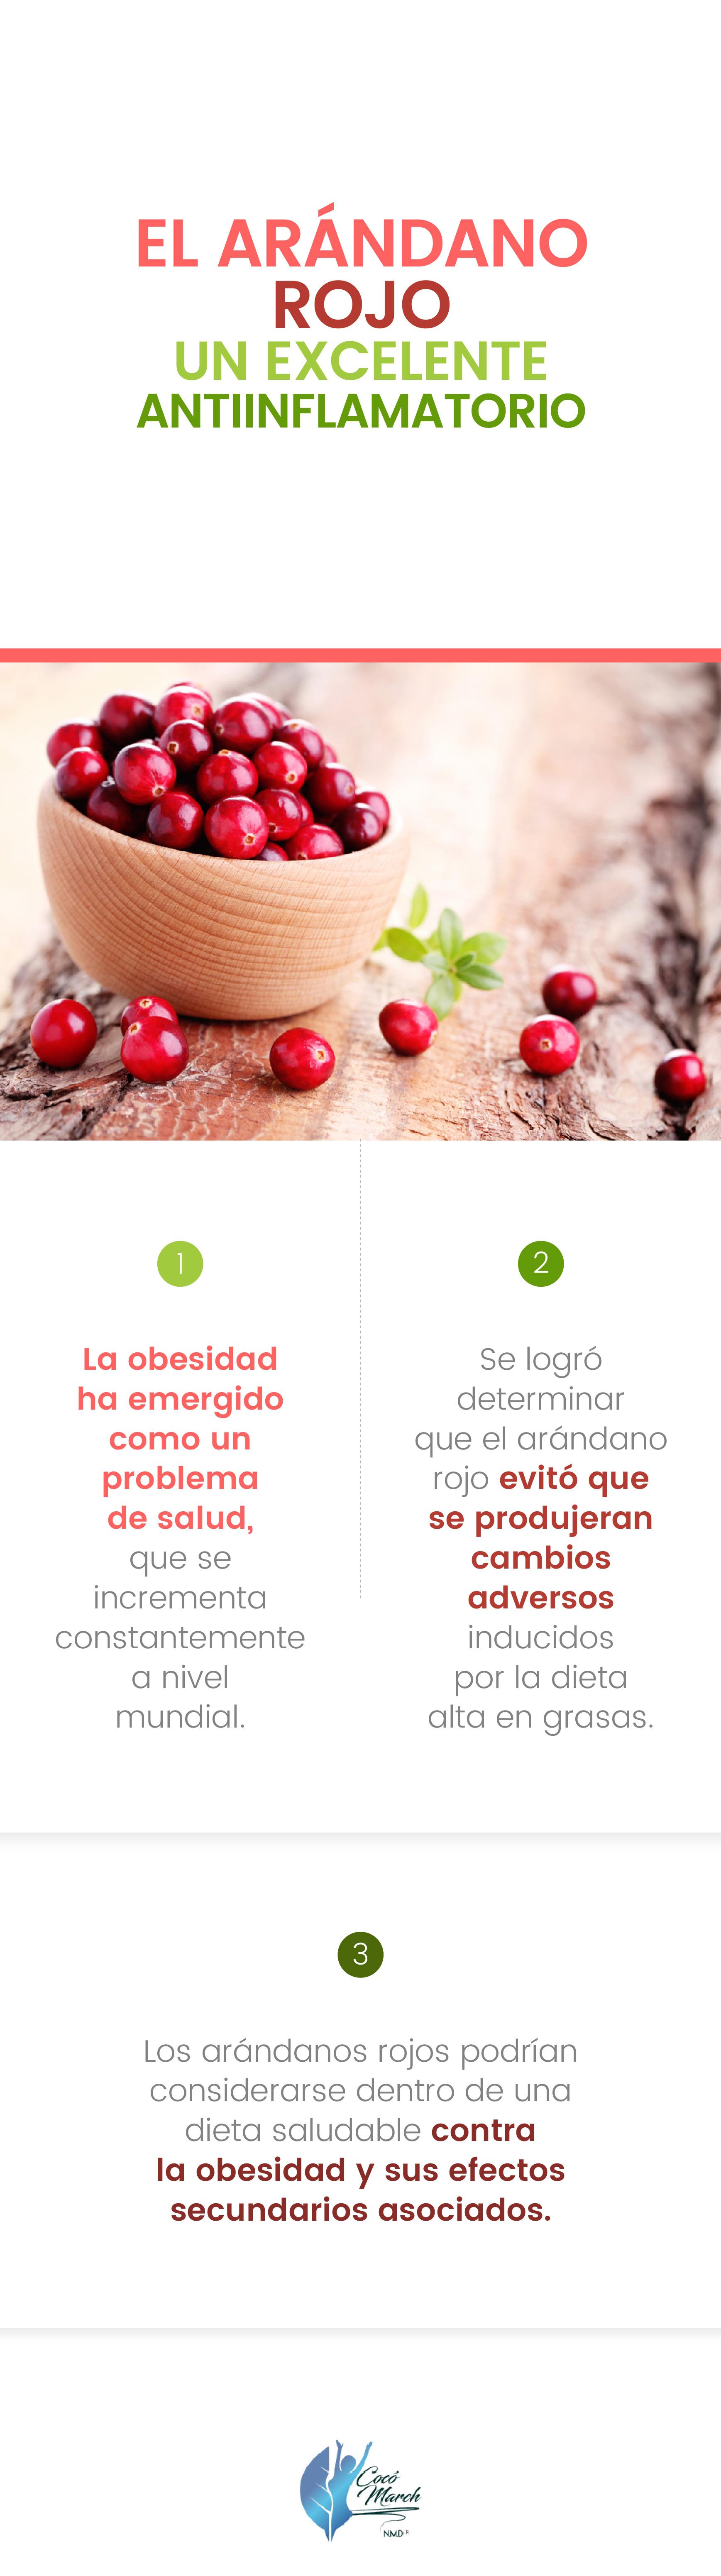 arandano-rojo-excelente-antiinflamatorio